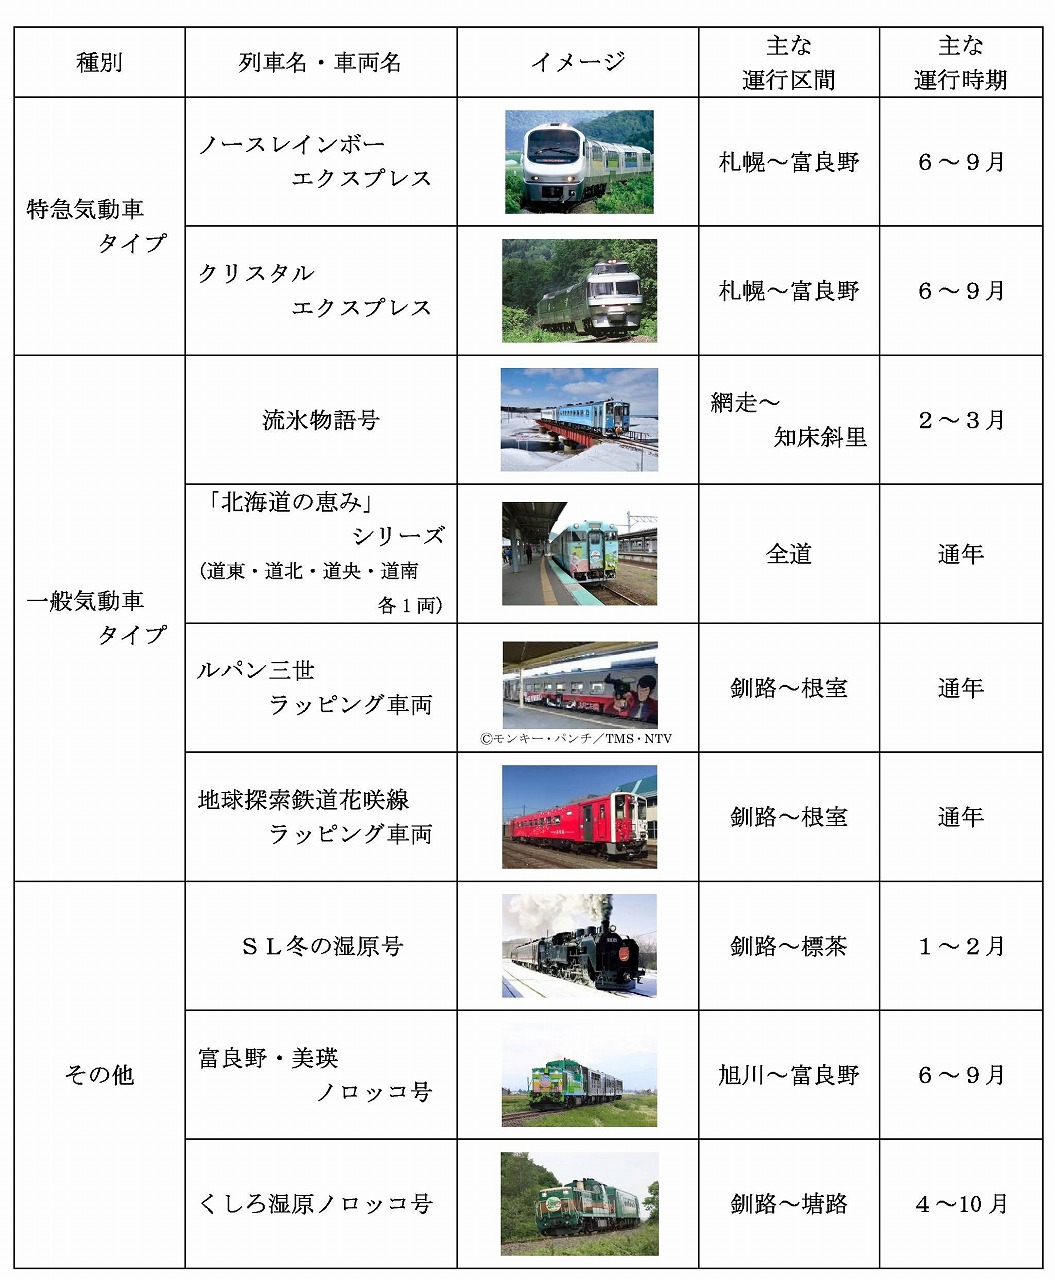 JR北海道の観光列車